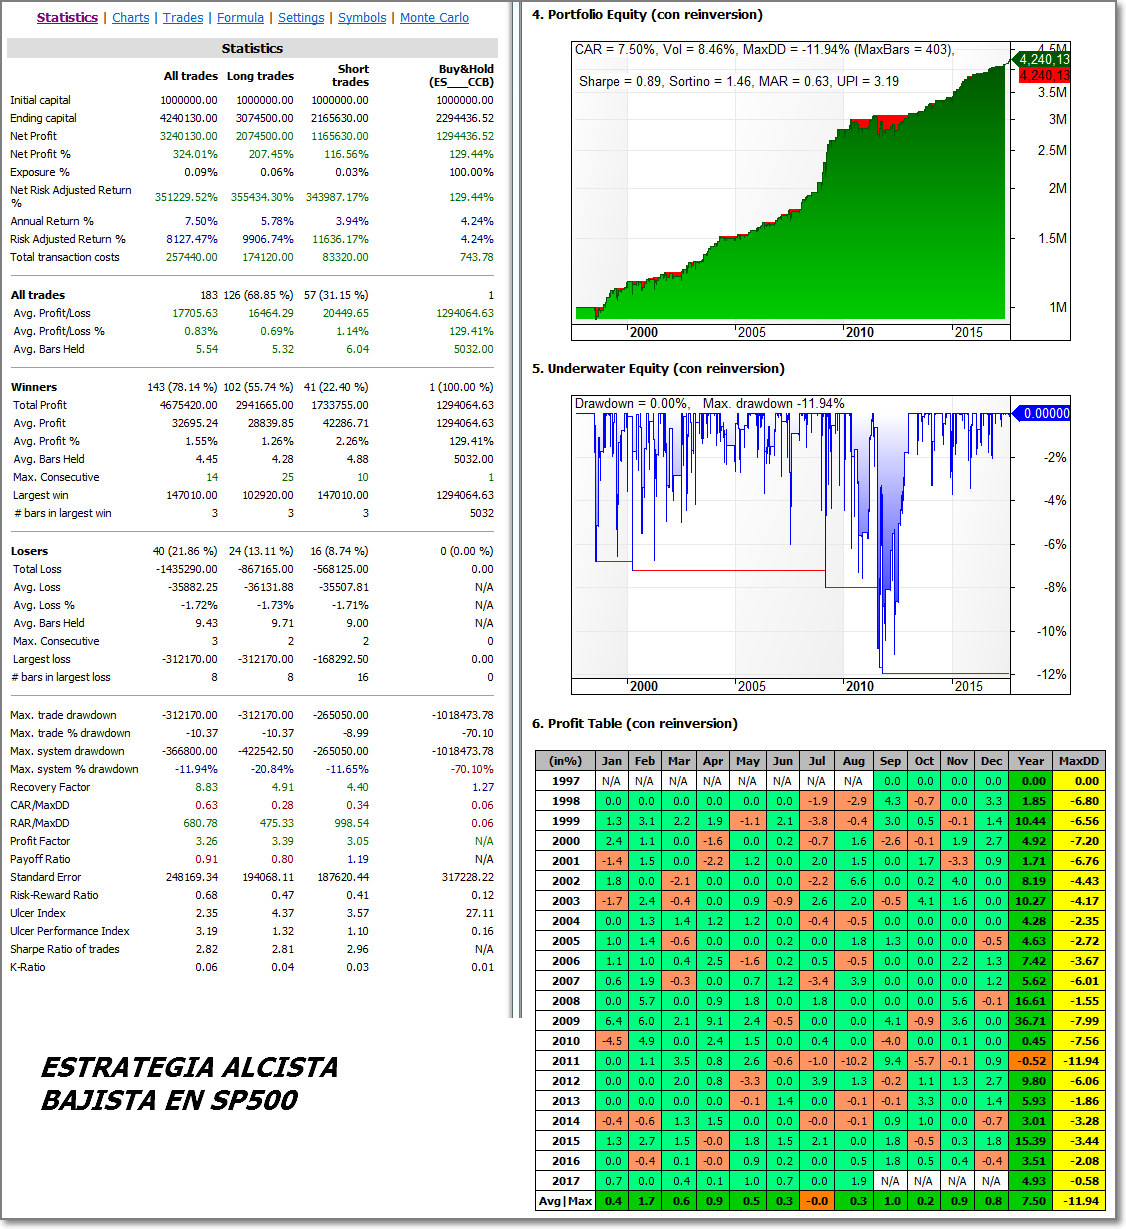 Sistema MersiSP - Estadisticas 1995 - 2017